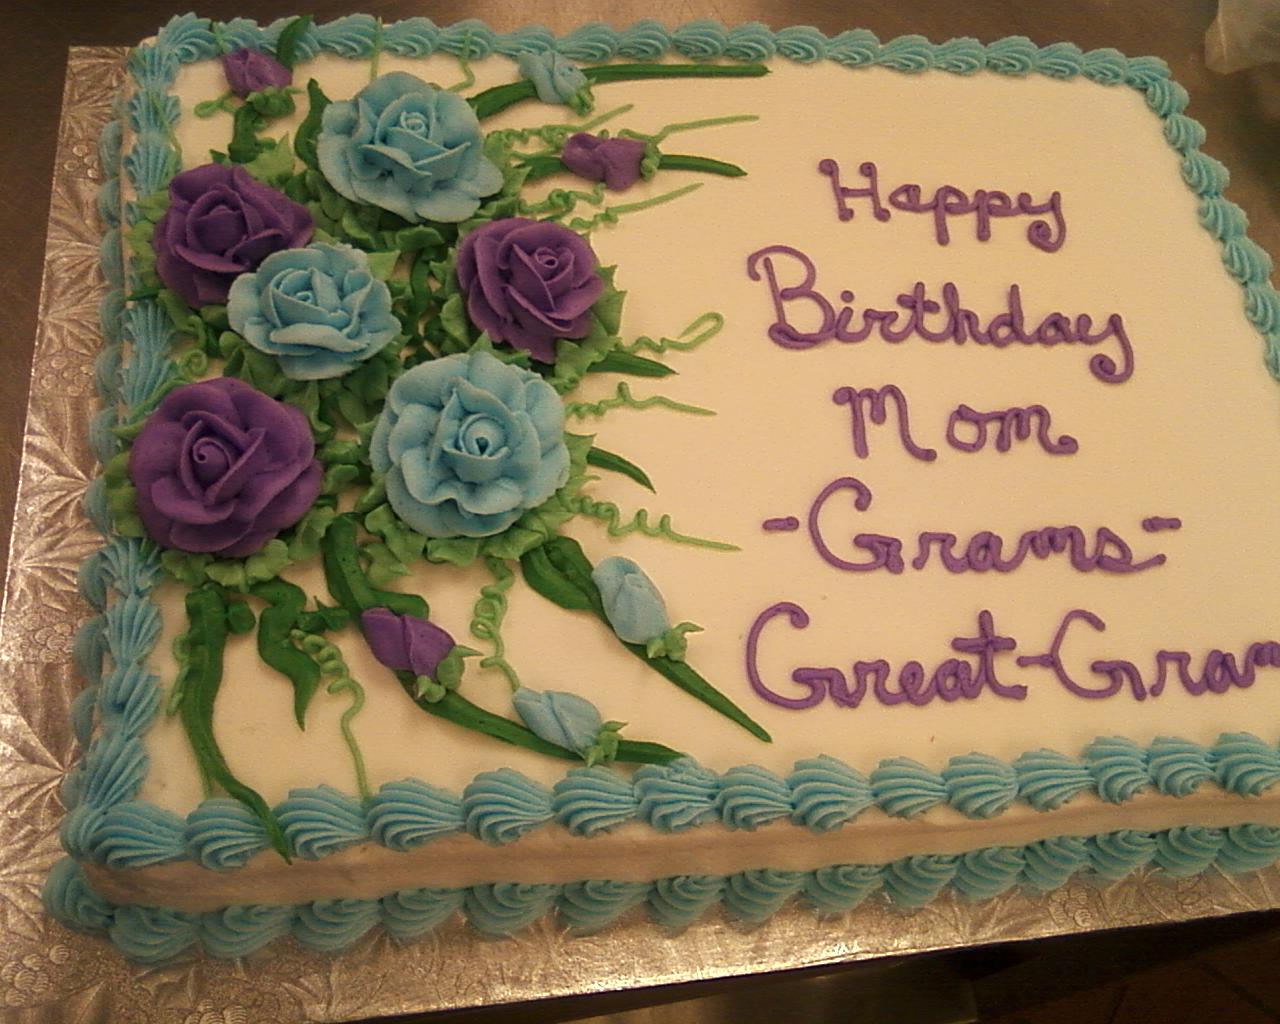 Half sheet birthday cake